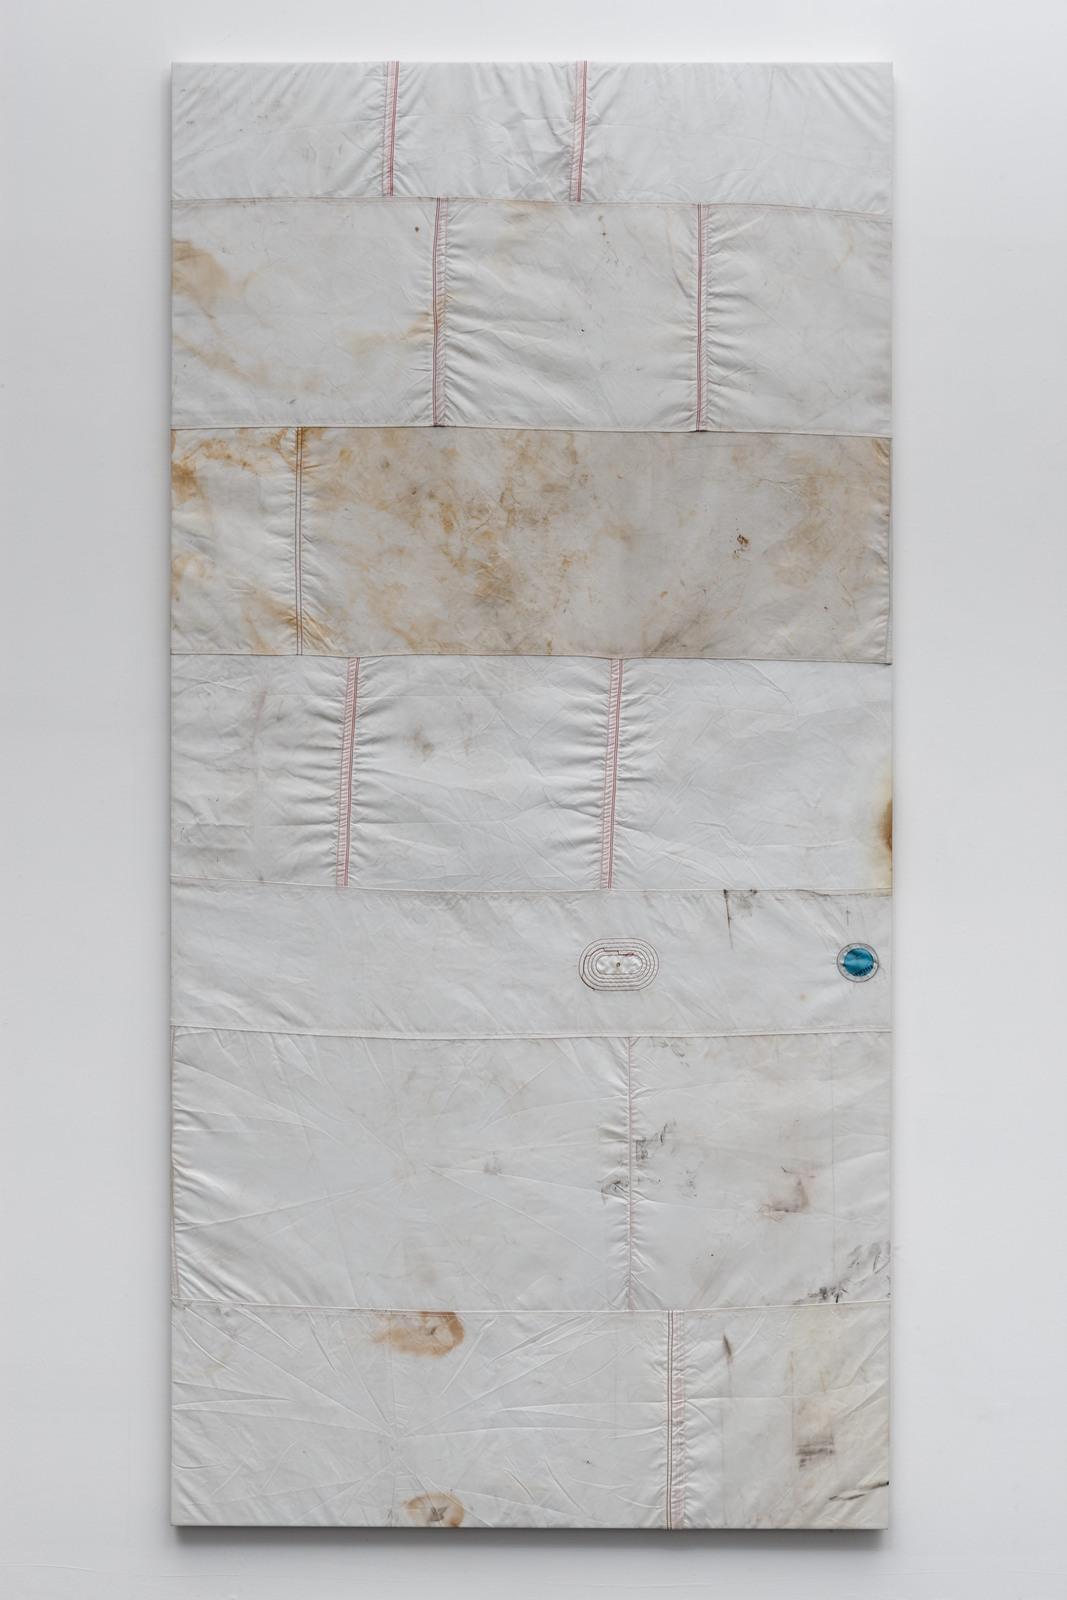 Ross Iannatti - Hysteresis no. 62, 2016